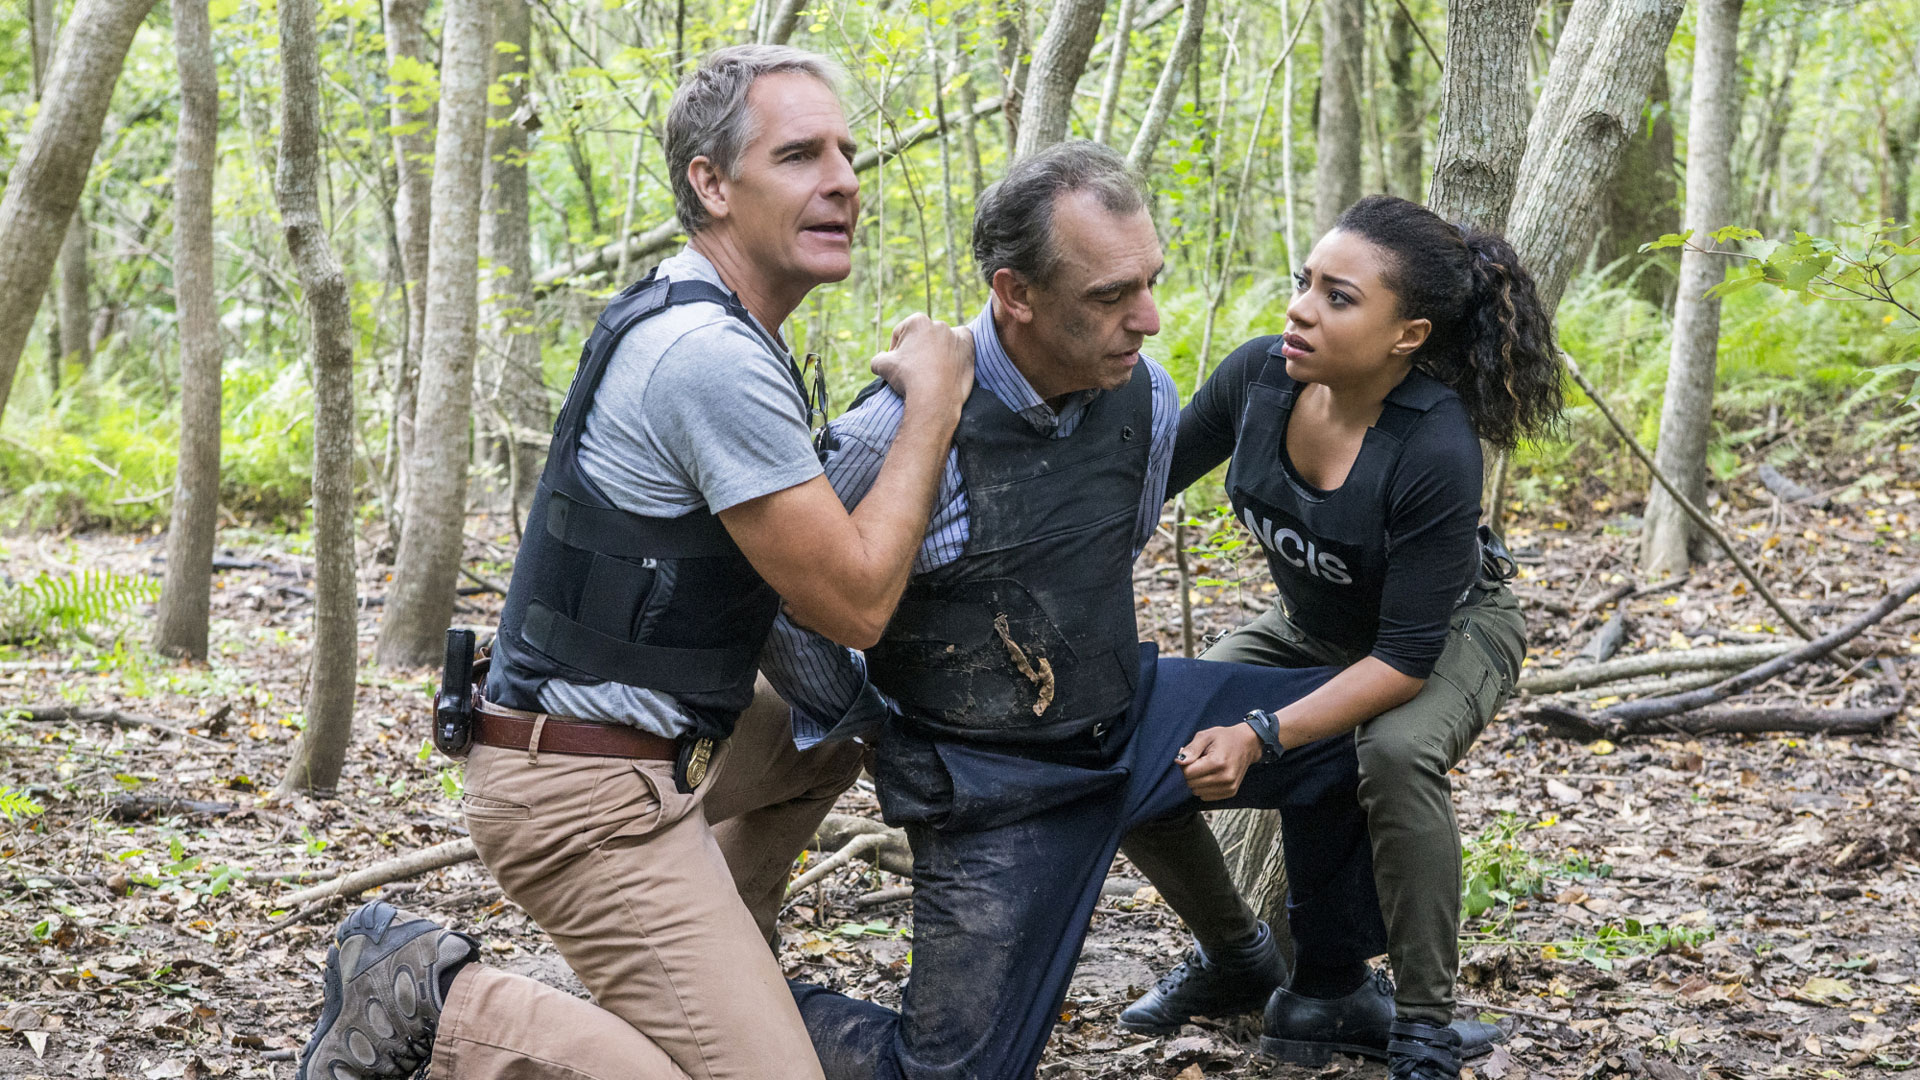 Scott Bakula as Dwayne Pride and Shalita Grant as Sonja Percy